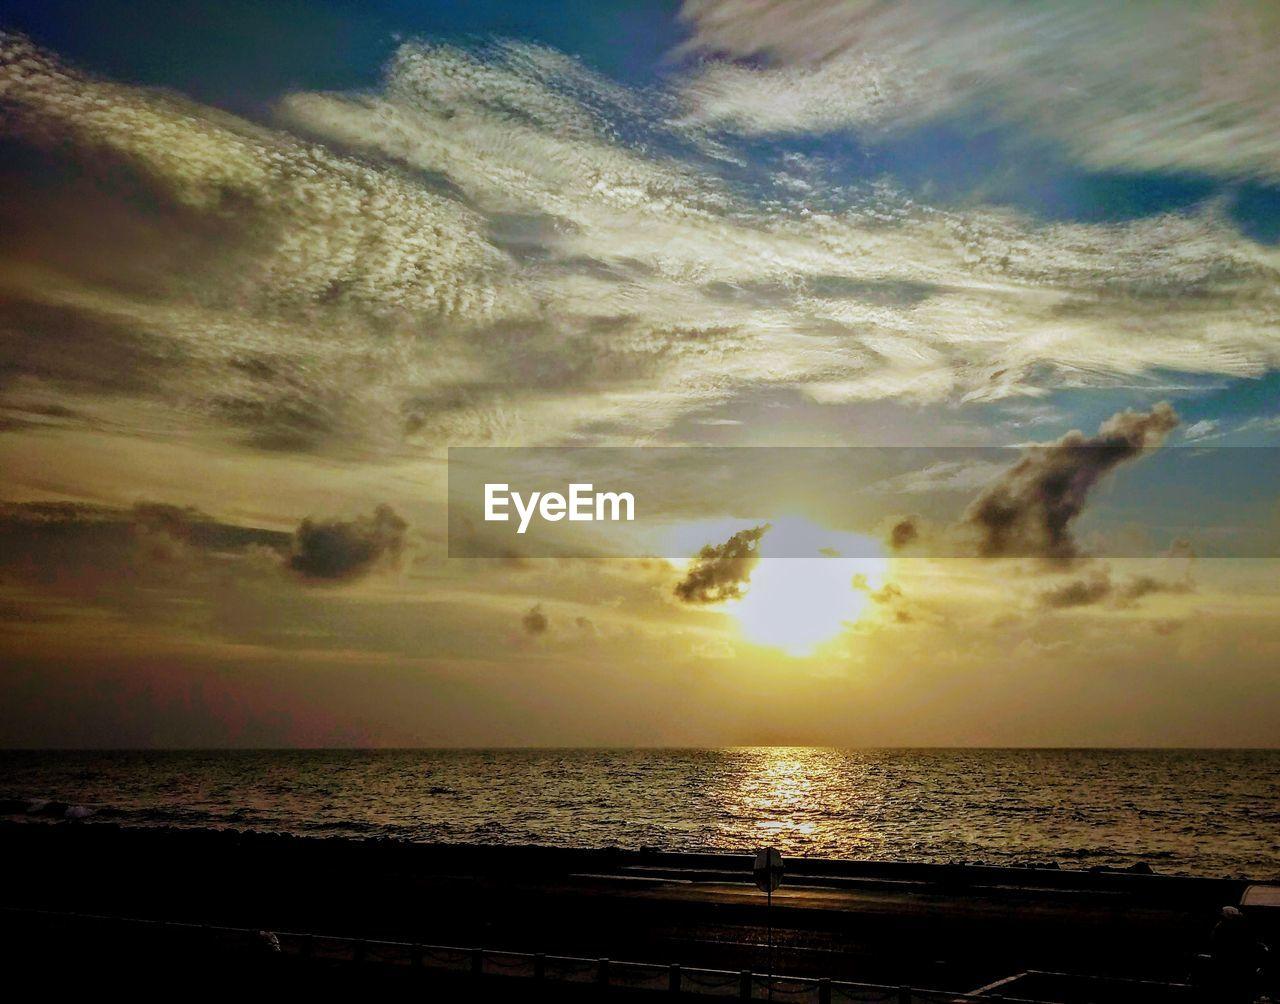 sky, cloud - sky, sea, horizon, horizon over water, sunset, scenics - nature, water, beauty in nature, tranquility, tranquil scene, nature, idyllic, no people, sunlight, dramatic sky, outdoors, land, beach